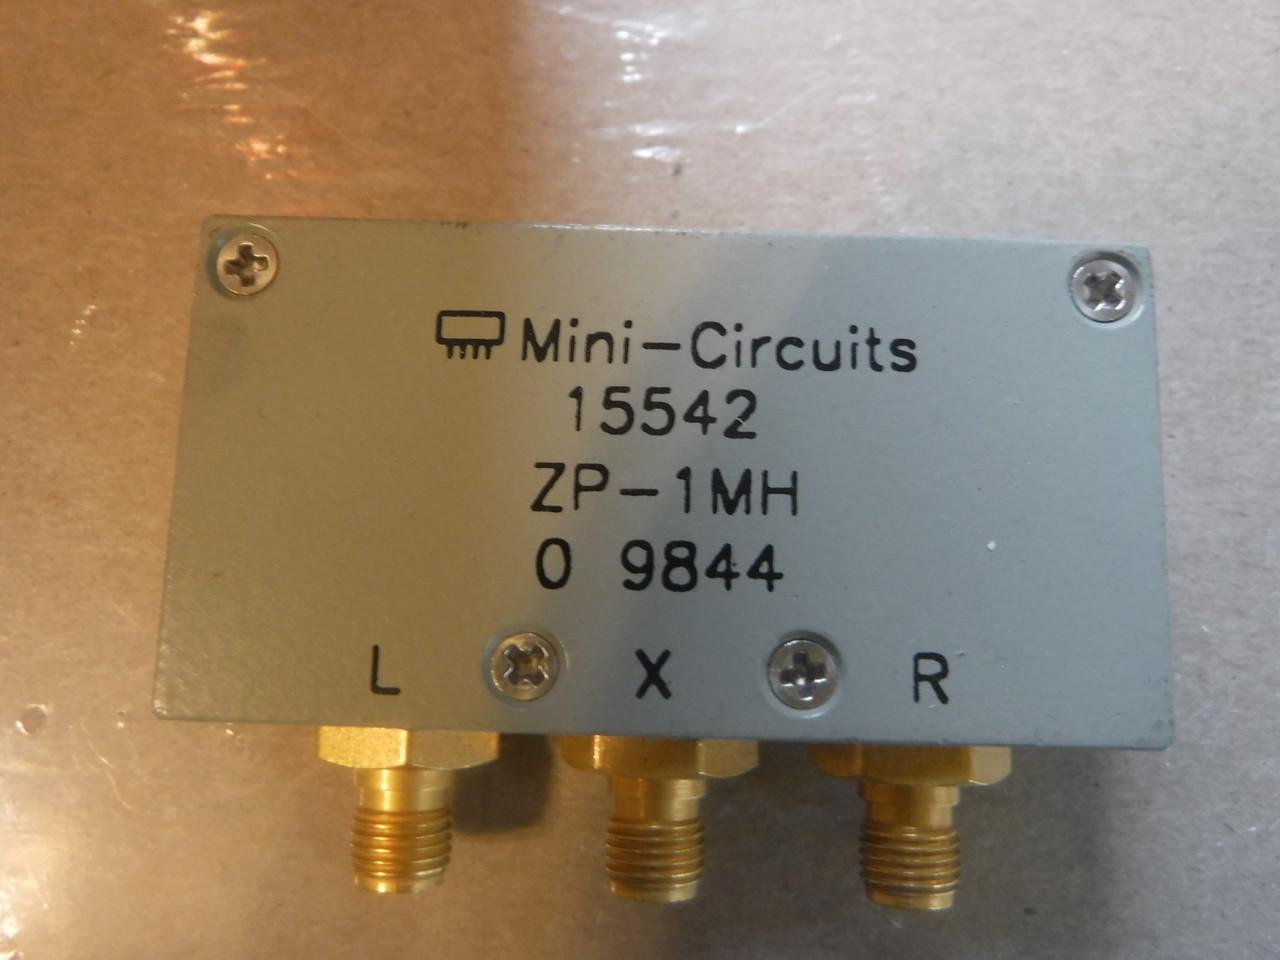 Mini Circuits ZP-1MH Phase Detector SMA